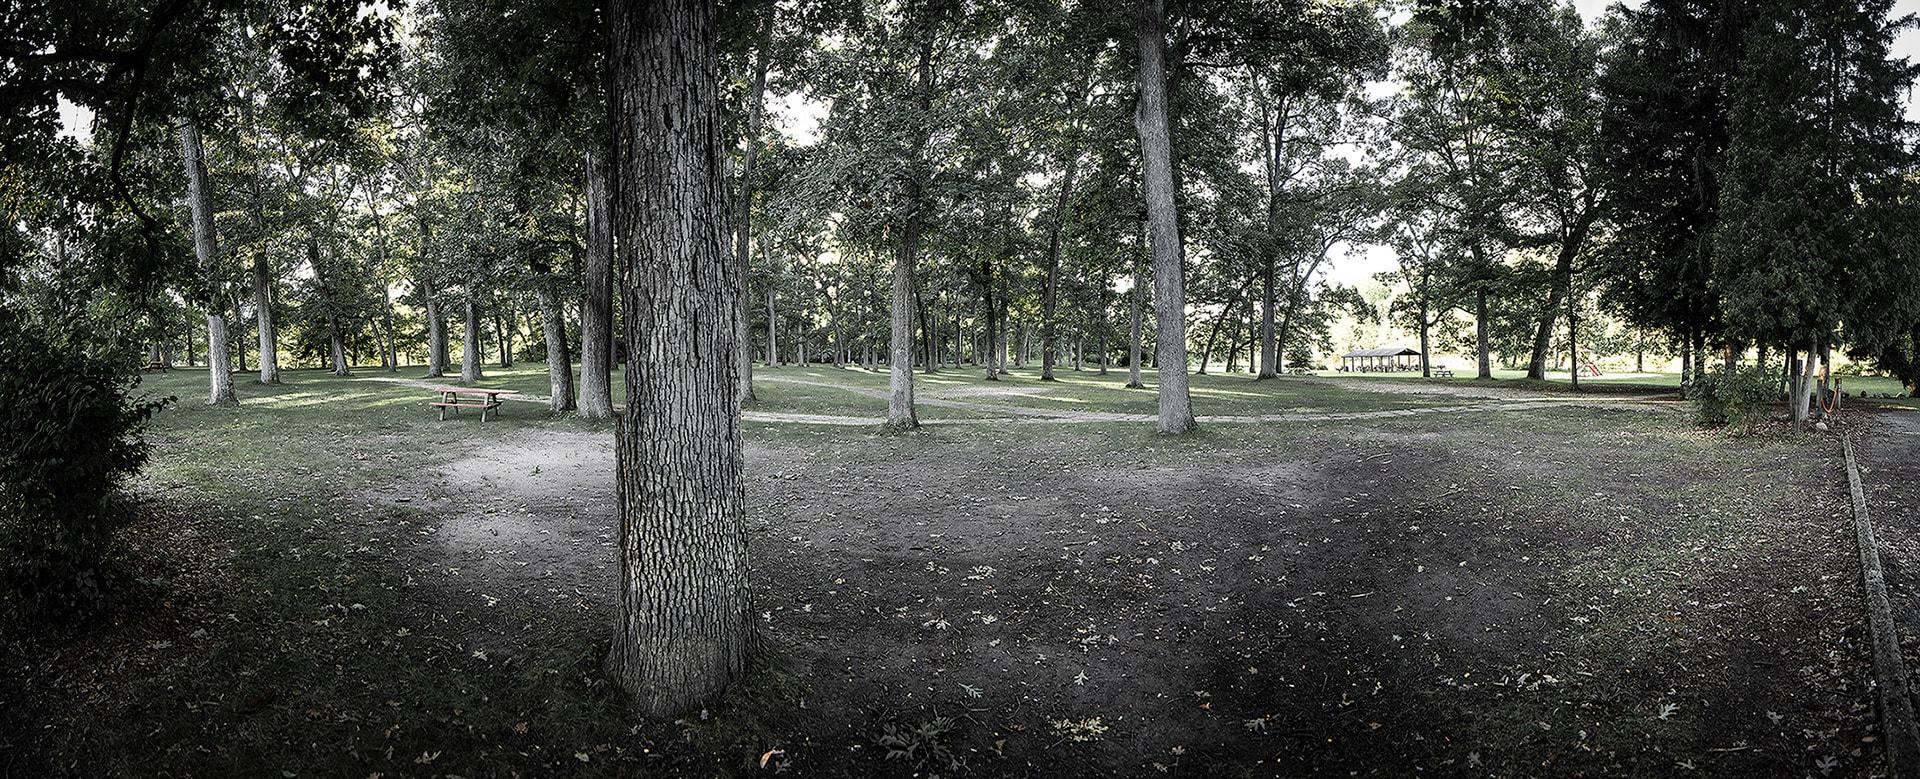 simpson-h-woods-creep-1-iphone-2-min.jpg